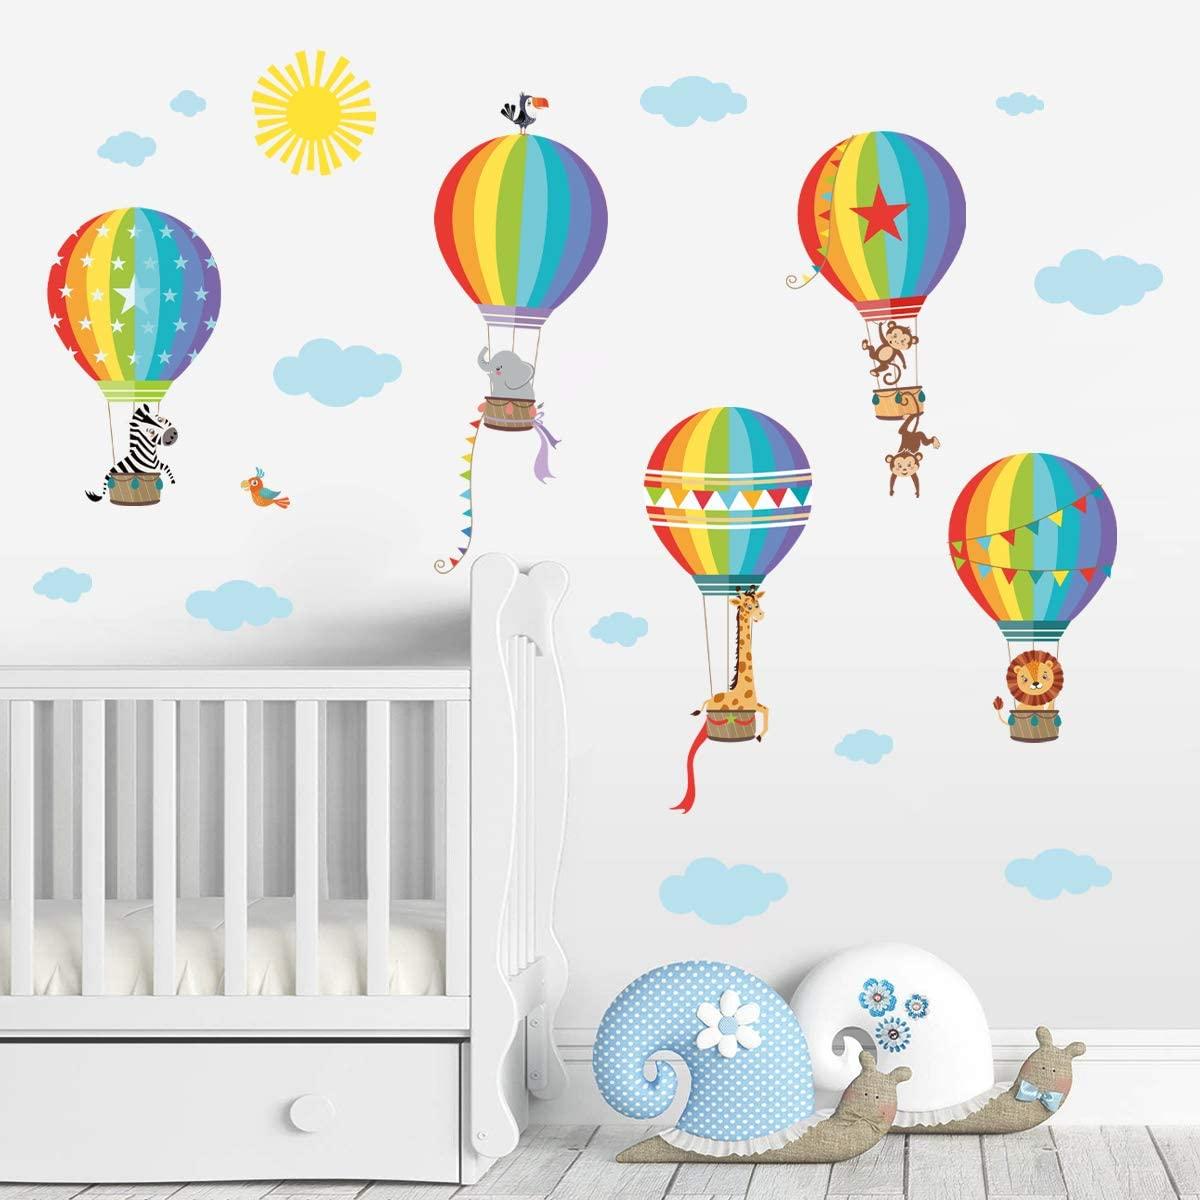 decalmile Rainbow Hot Air Balloon Wall Decals Animals Monkey Giraffe Elephant Wall Stickers Baby Nursery Kids Bedroom Playroom Wall Decor